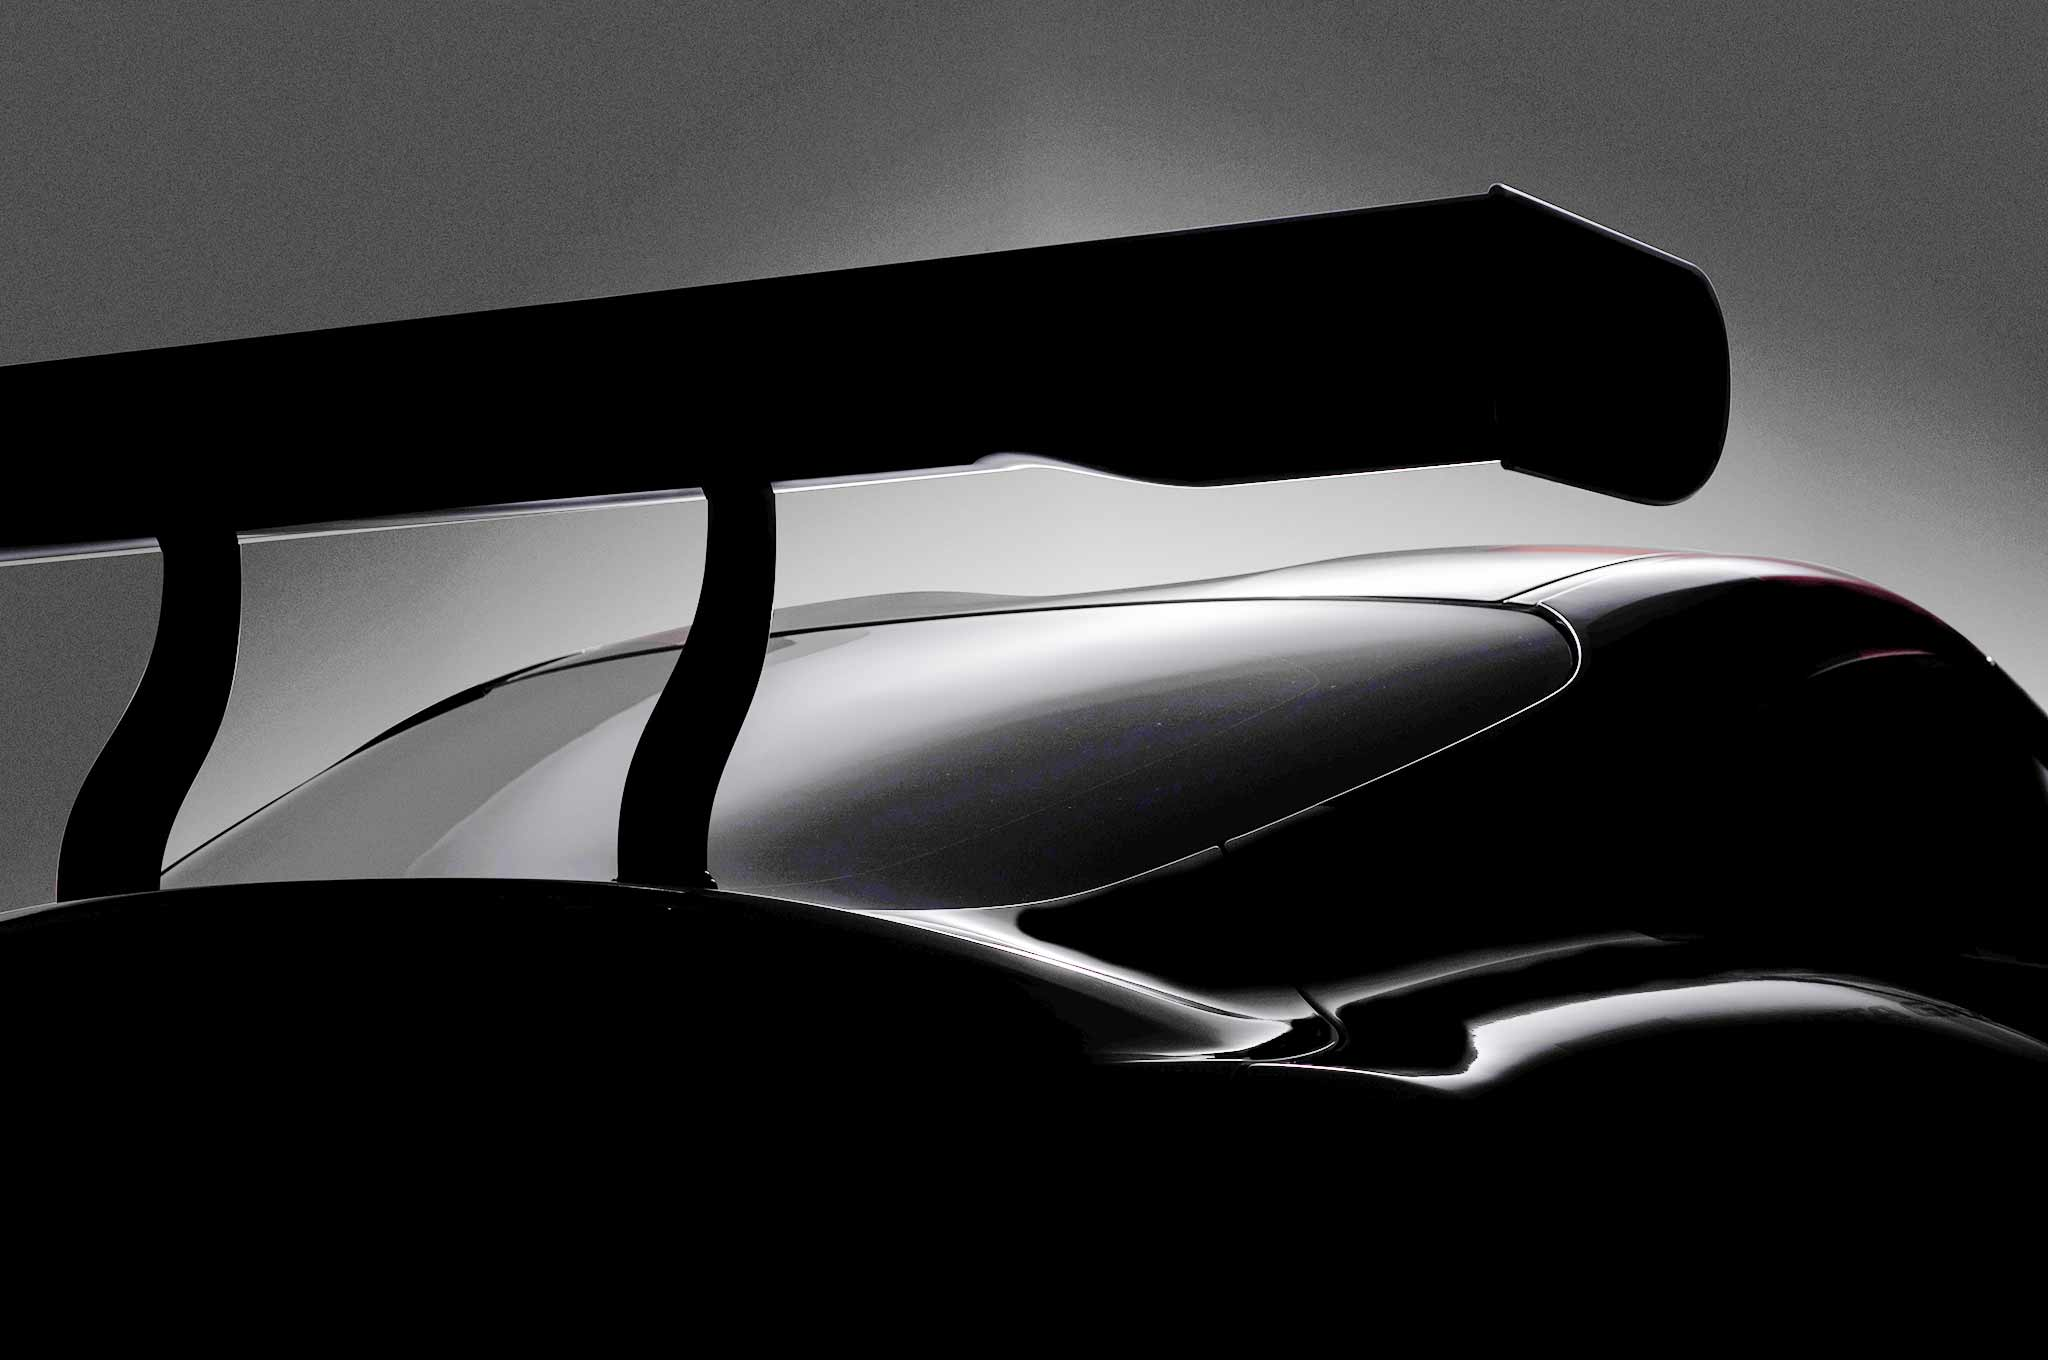 Toyota Supra Geneva 2018 Teaser